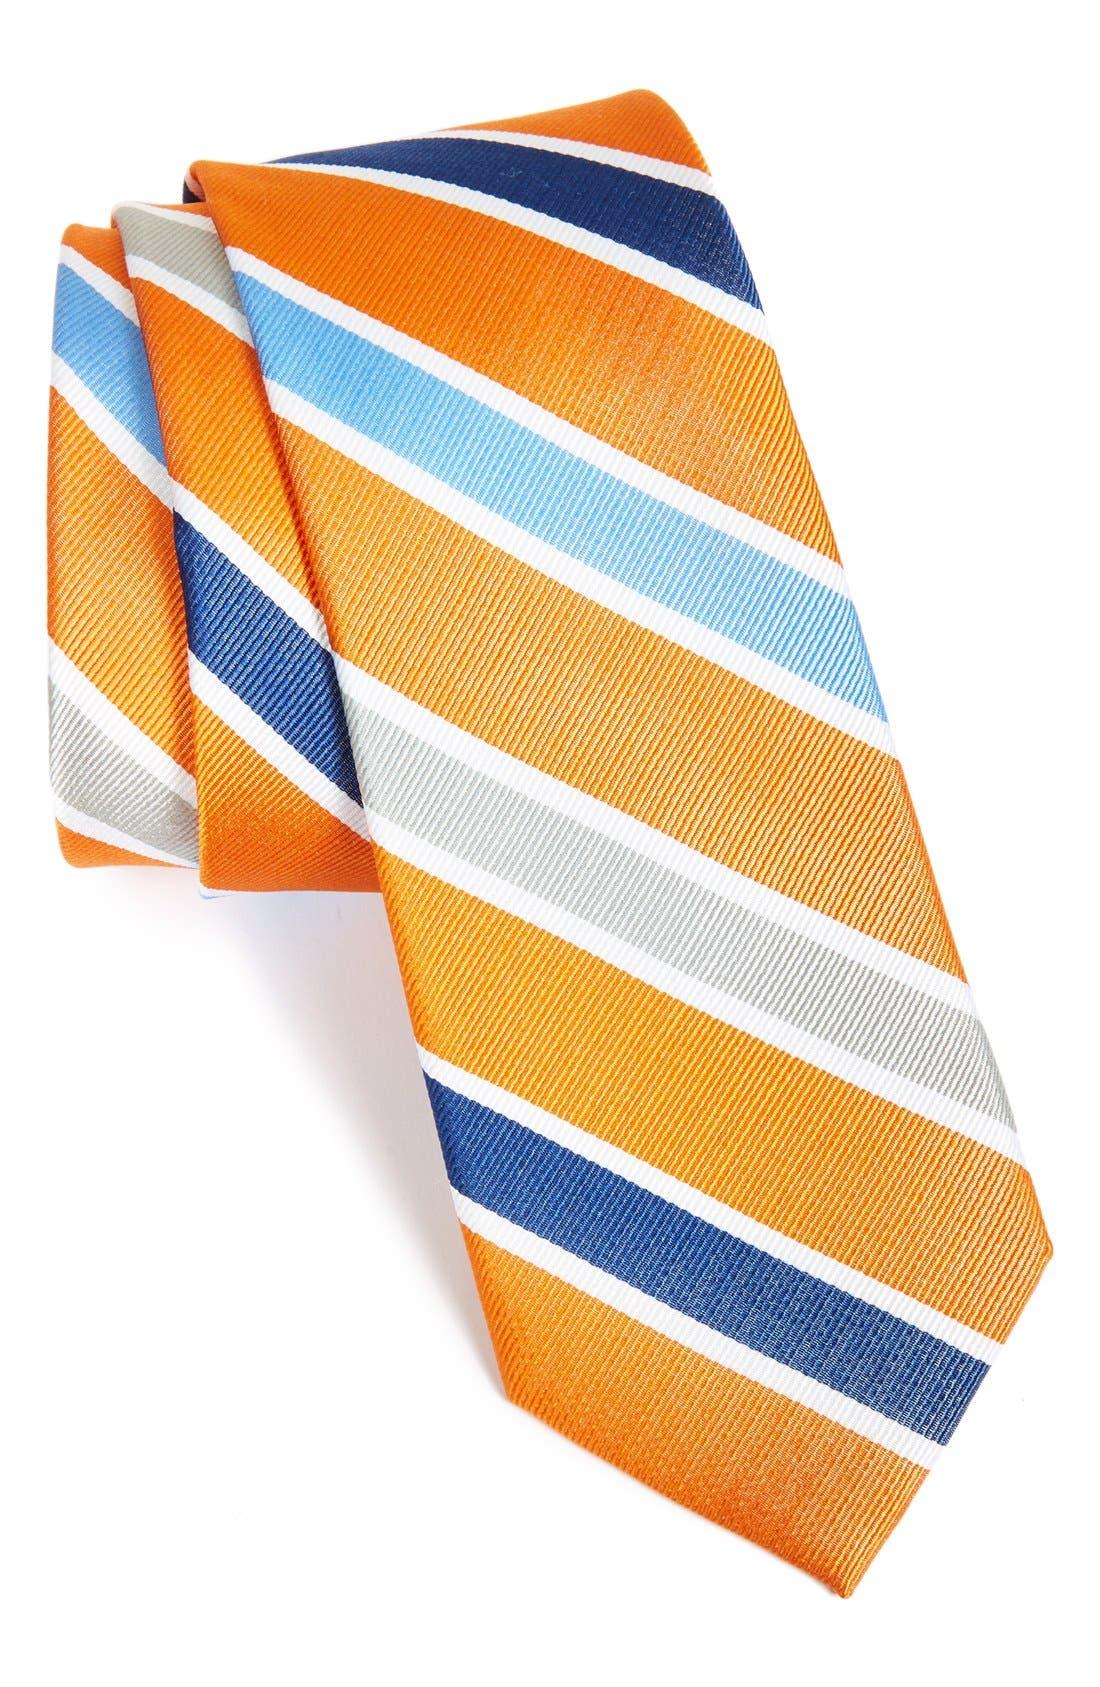 Main Image - 1901 'Como Stripe' Woven Silk Tie